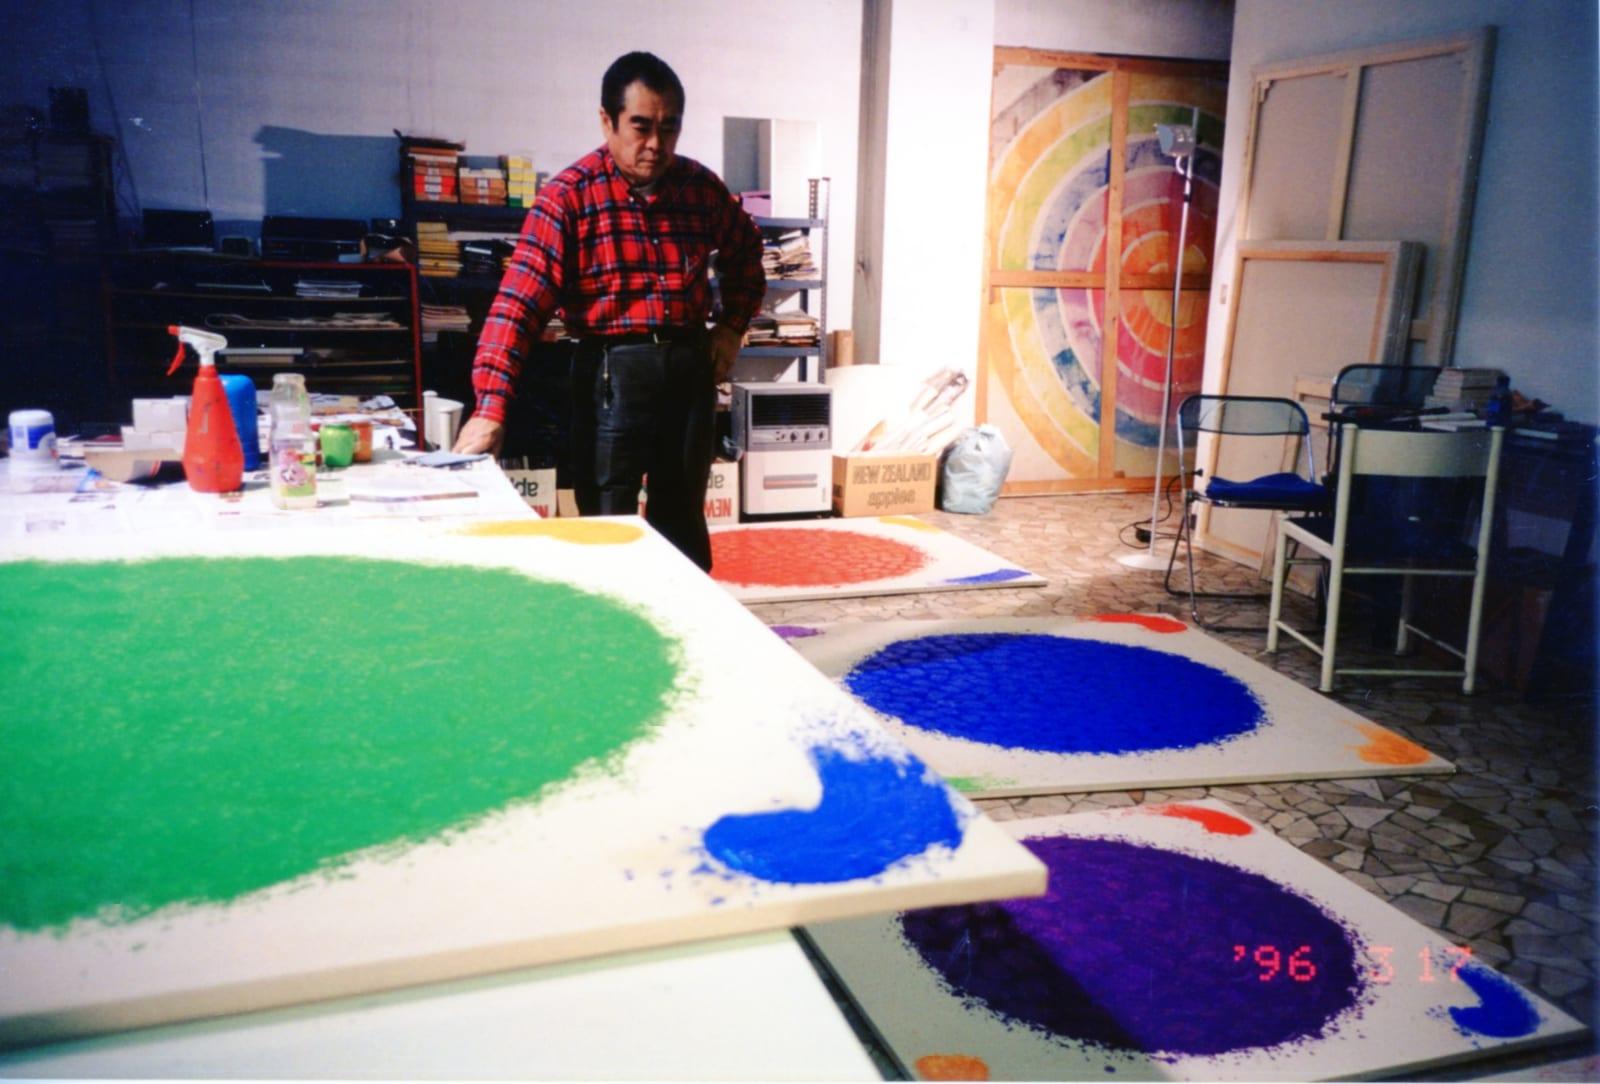 1996, Hsiao Chin in his Milan studio 1996年蕭勤於米蘭工作室